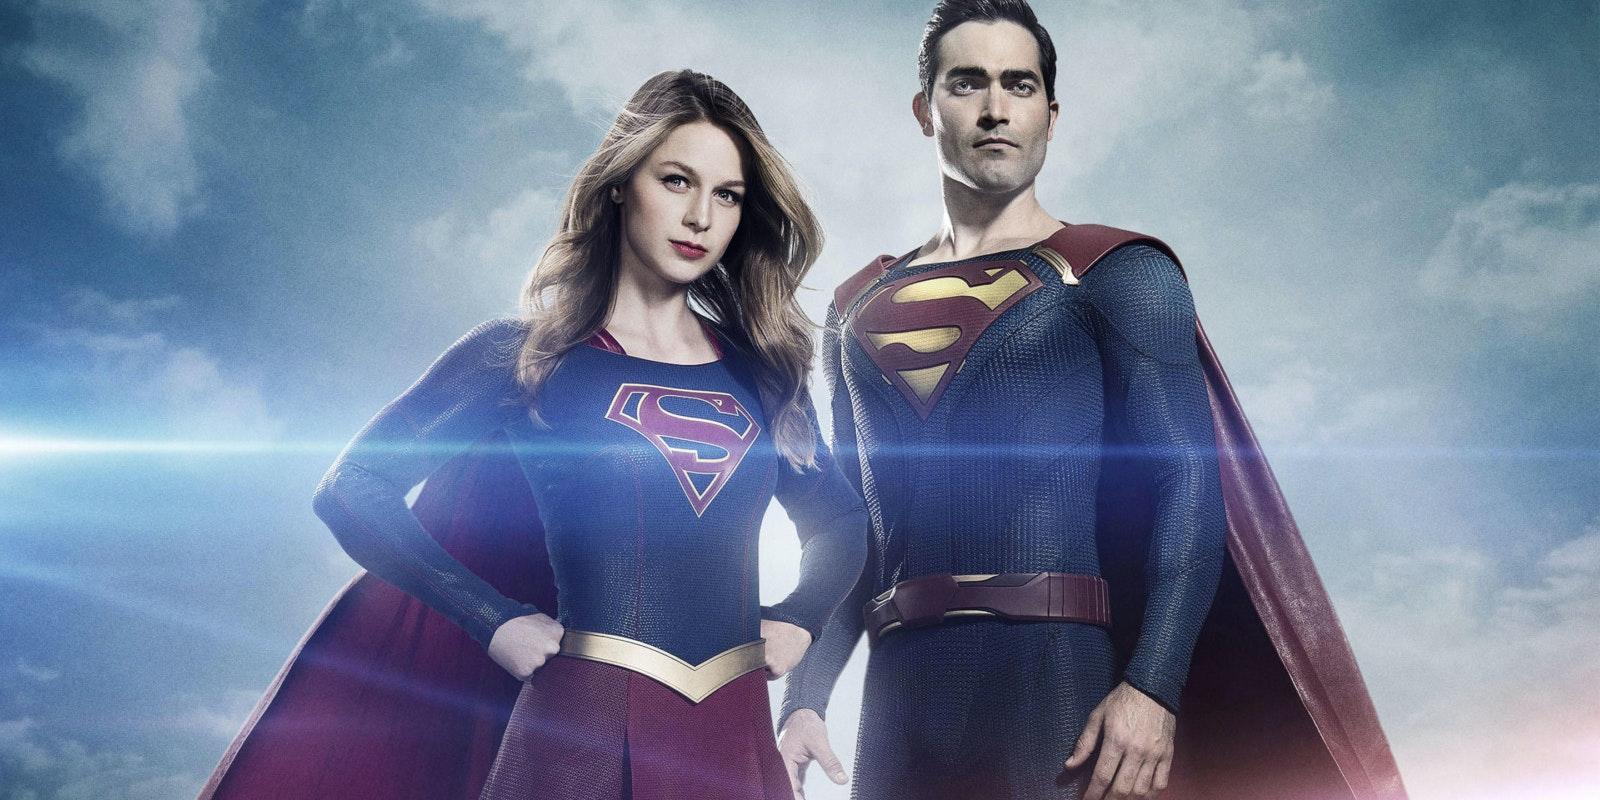 Melissa Benoist and Tyler Hoechlin as Supergirl and Superman.